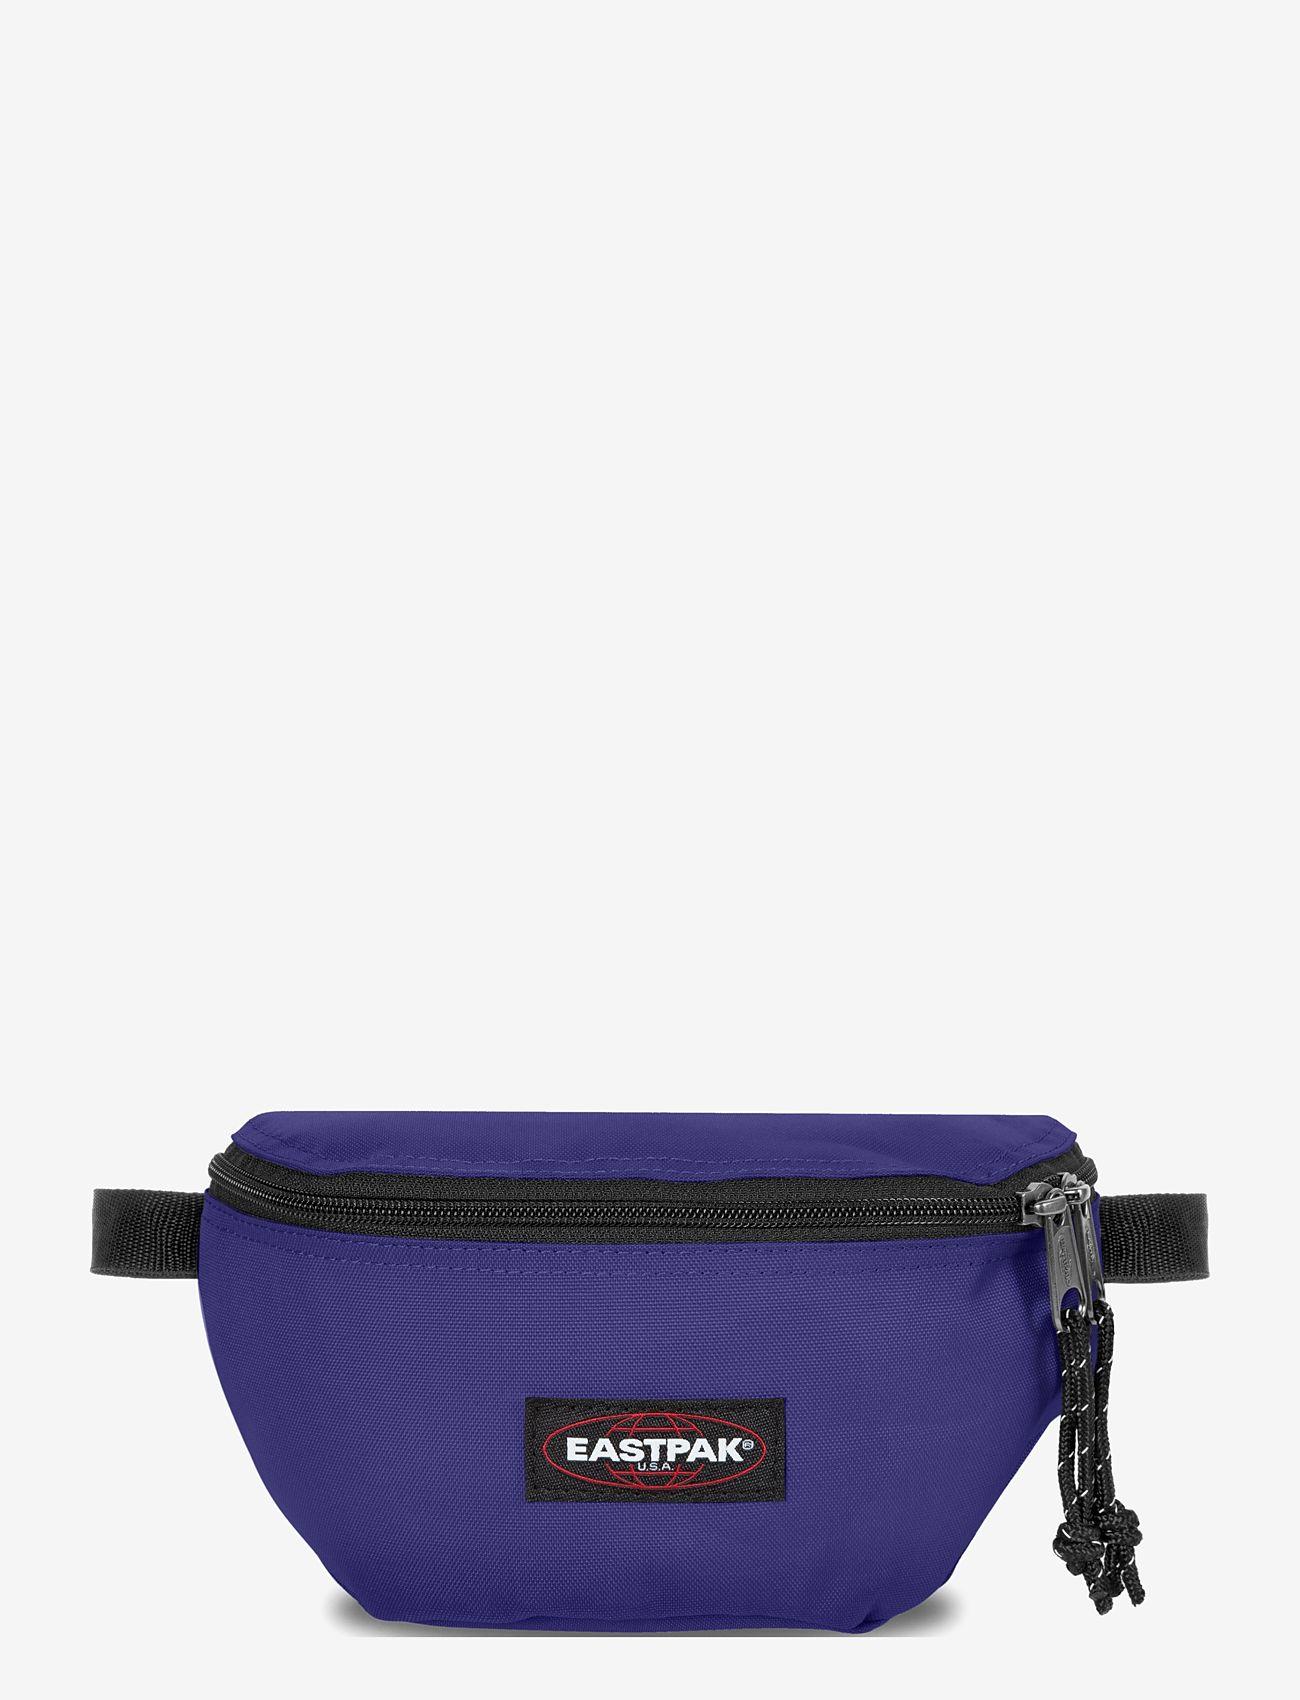 Eastpak - SPRINGER - heuptassen - amethyst purple - 0